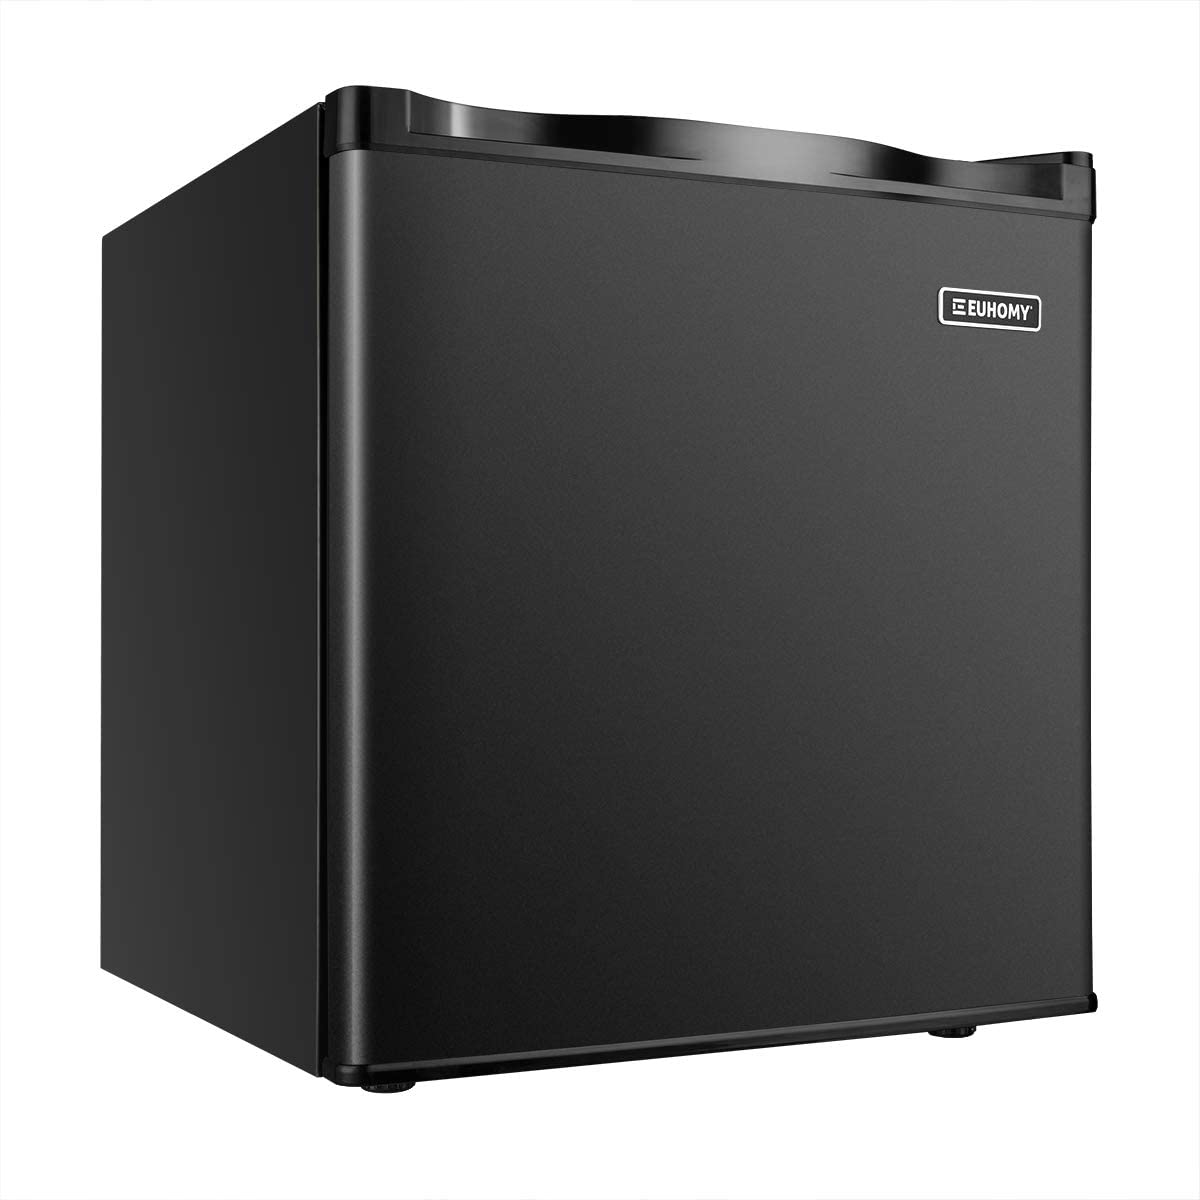 Euhomy Mini Freezer Countertop, Energy Star 1.1 Cubic Feet,Compact Single Door Upright Freezer with Reversible Adjustable Stainless Steel Door for Home/Dorms/Apartment/Office(Black)